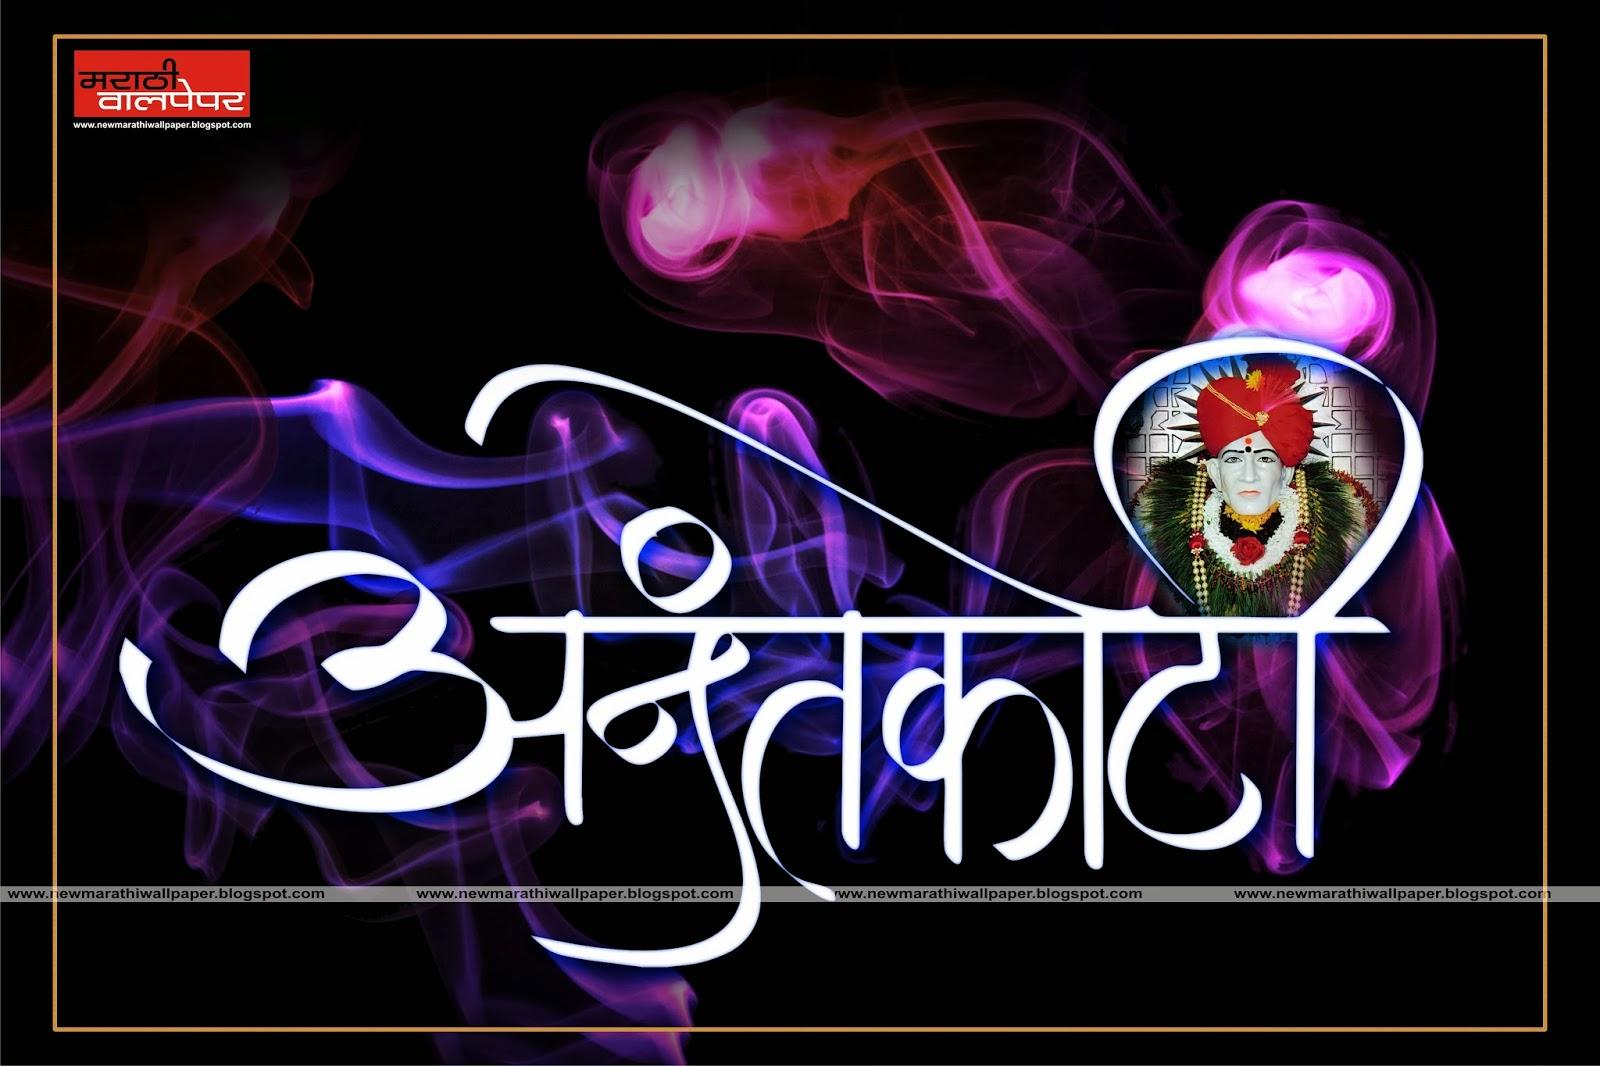 Anantakoti Gajanan Maharaj Wallpapers HD Vectors or Graphics